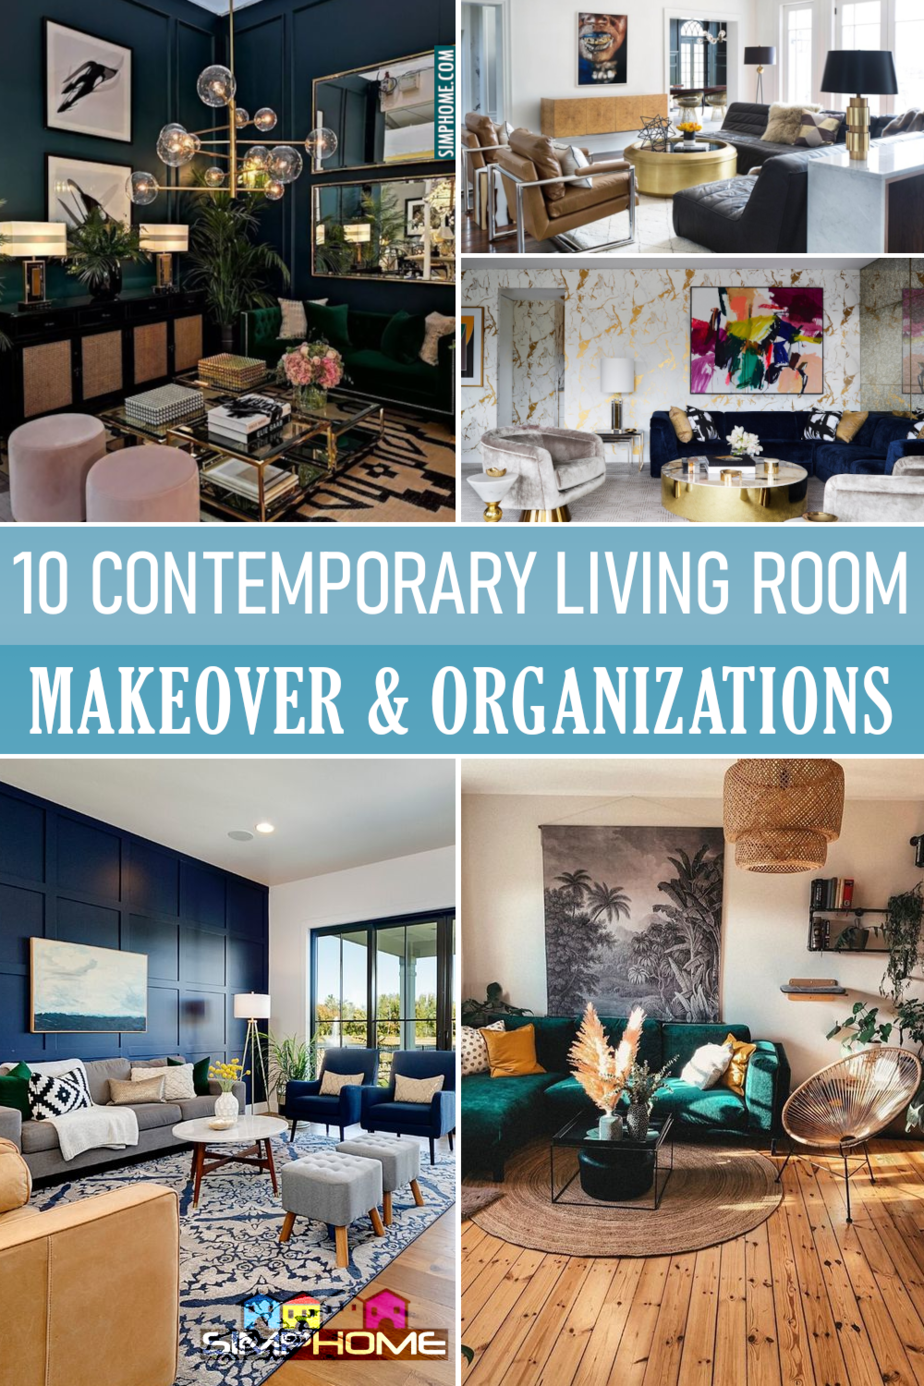 10 Contemporary Living Room Ideas Featured at Simphome.com